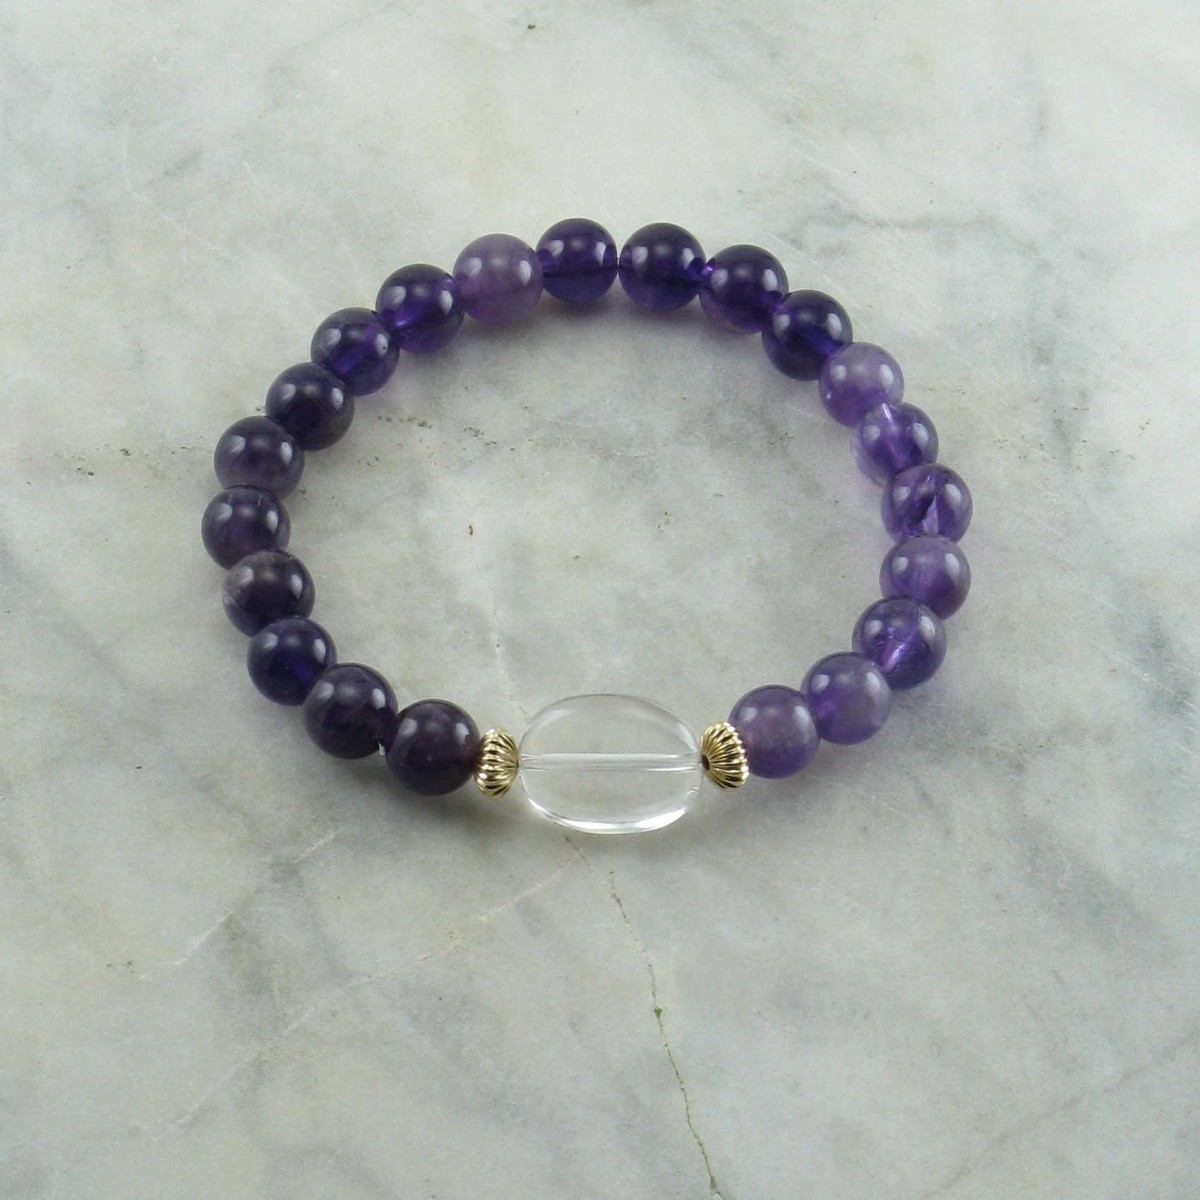 Earth_Mala_Bracelet_21_Amethyst_Mala_Beads_Buddhist_Bracelet